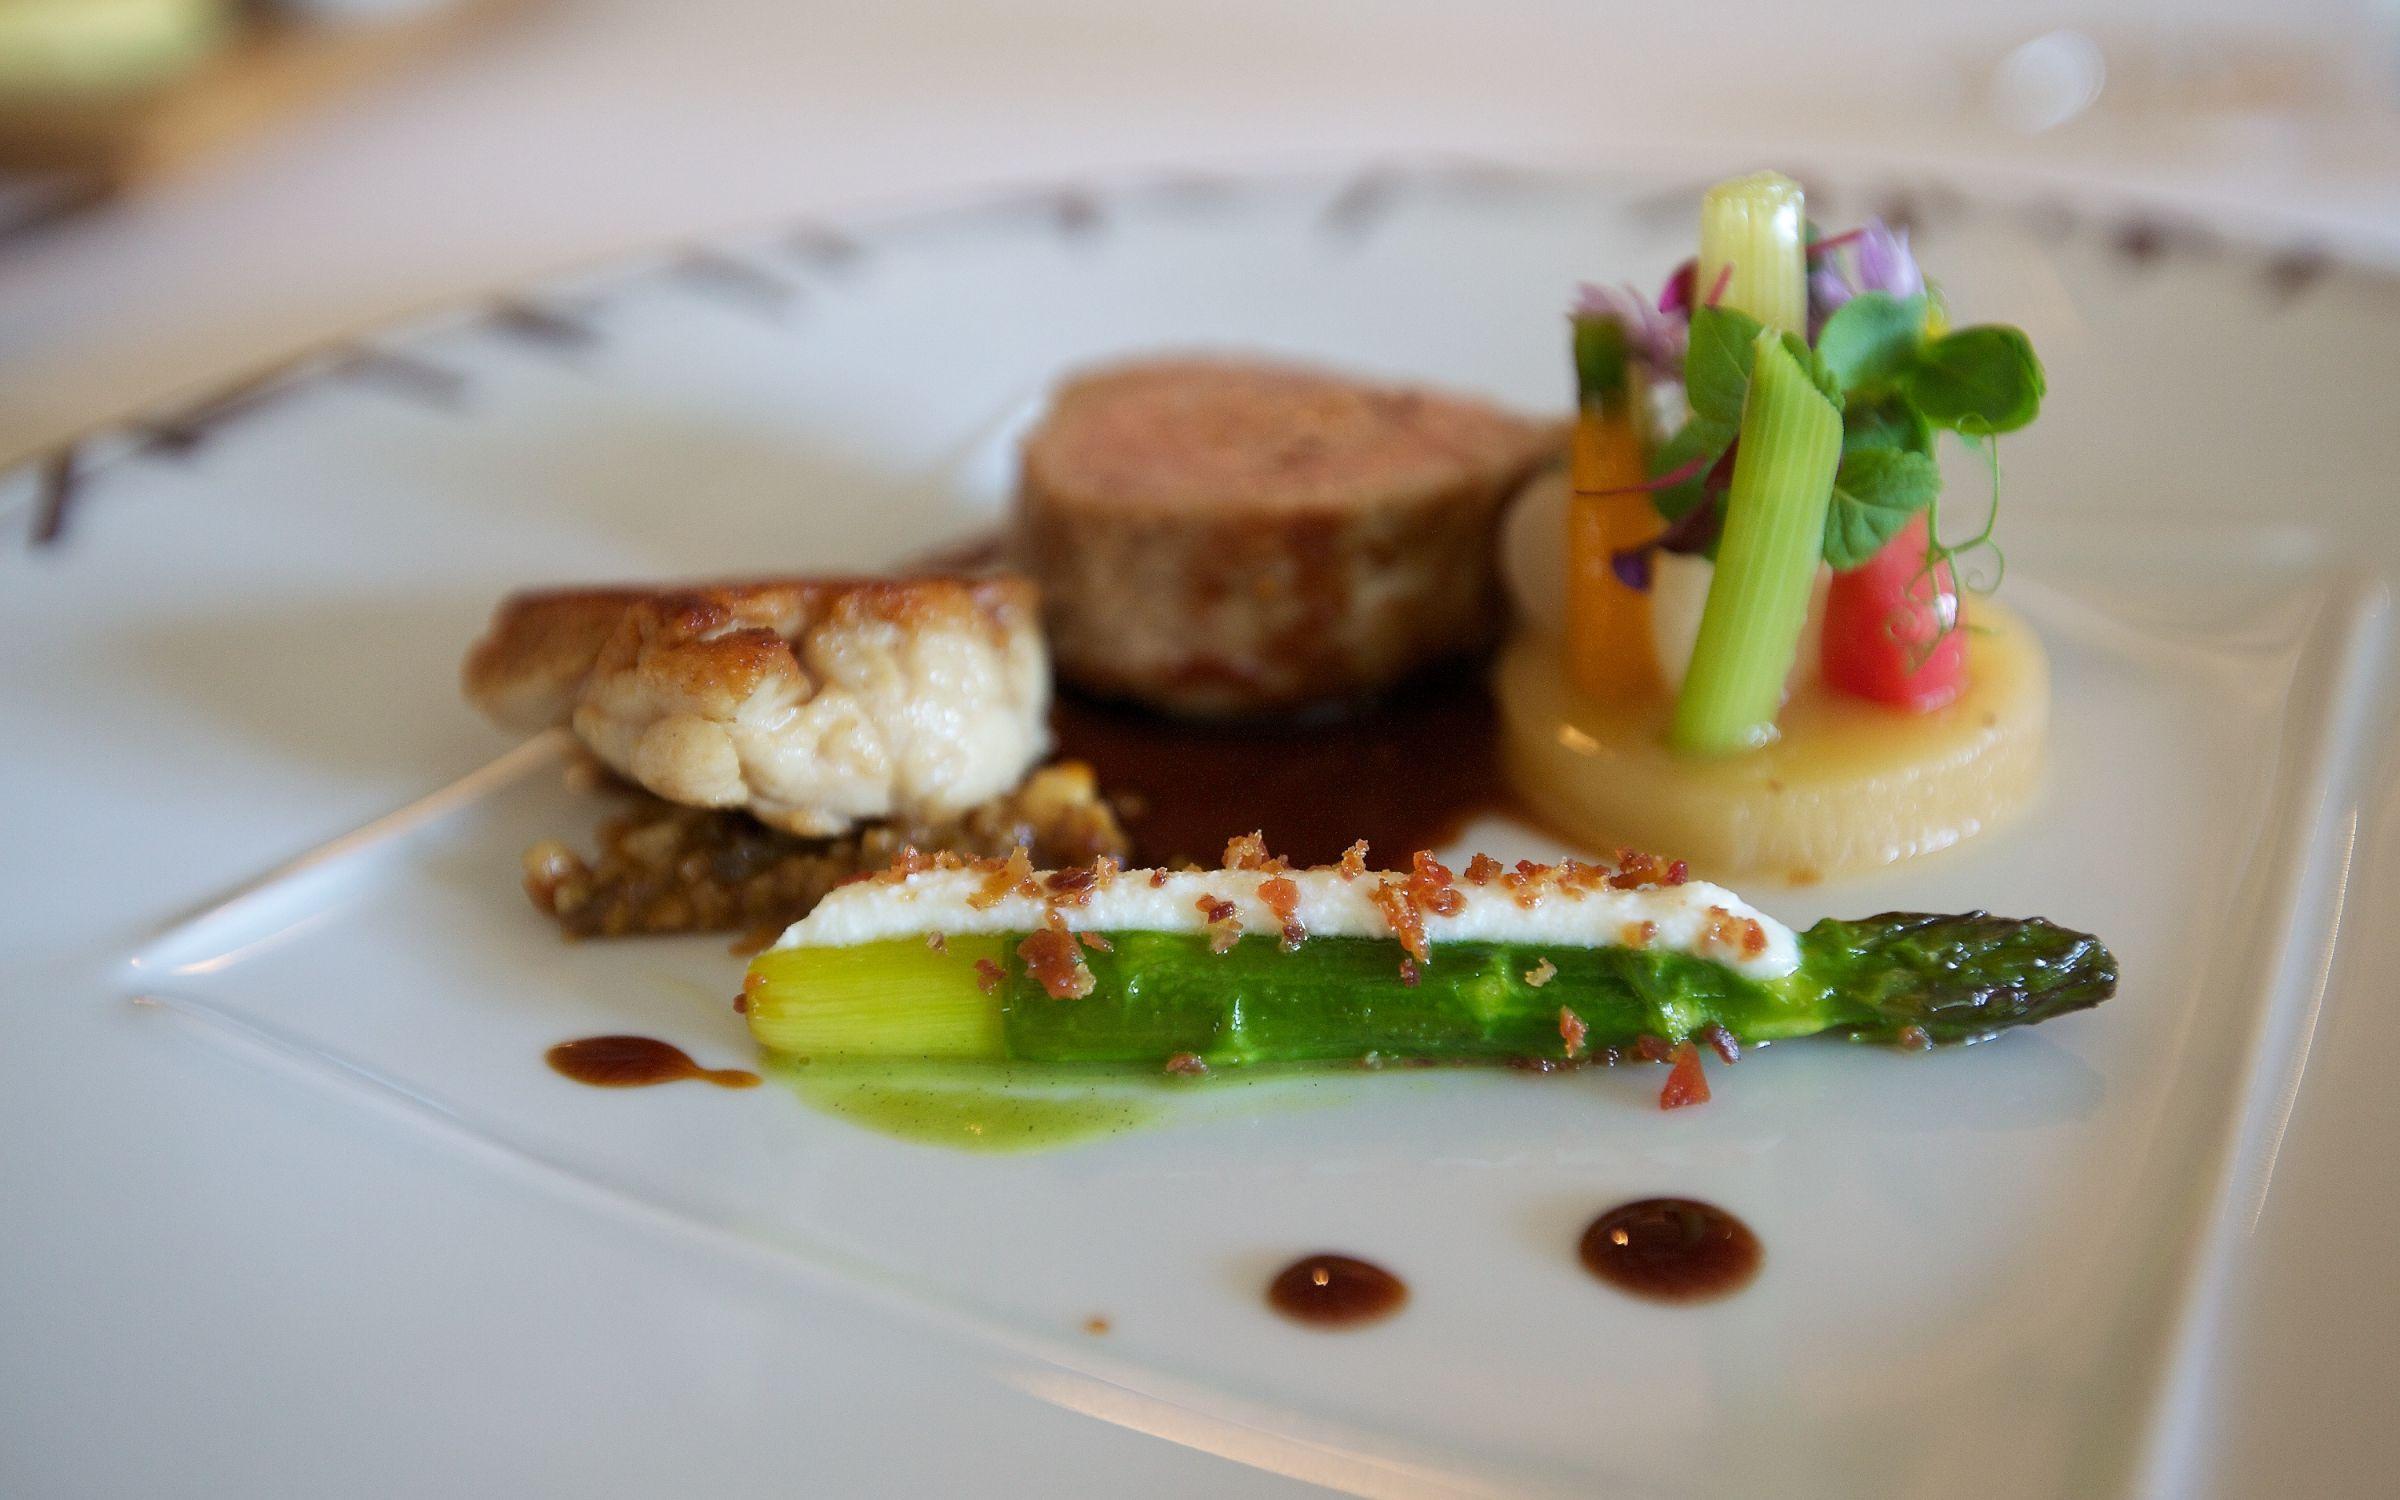 Bernard loiseau qli travel qli travel restaurants for Cuisine bernard